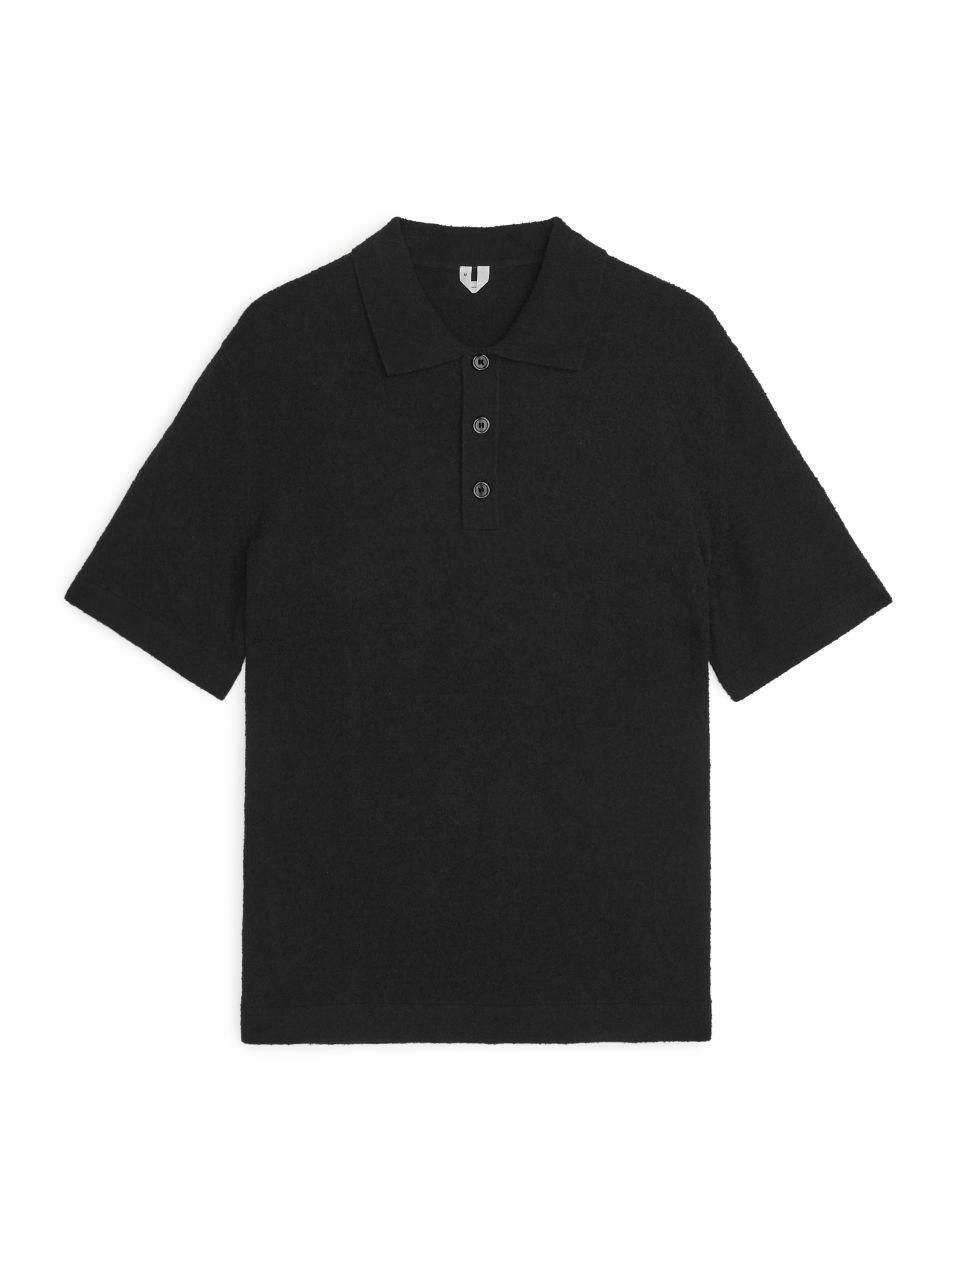 Bouclé Polo Shirt - Black